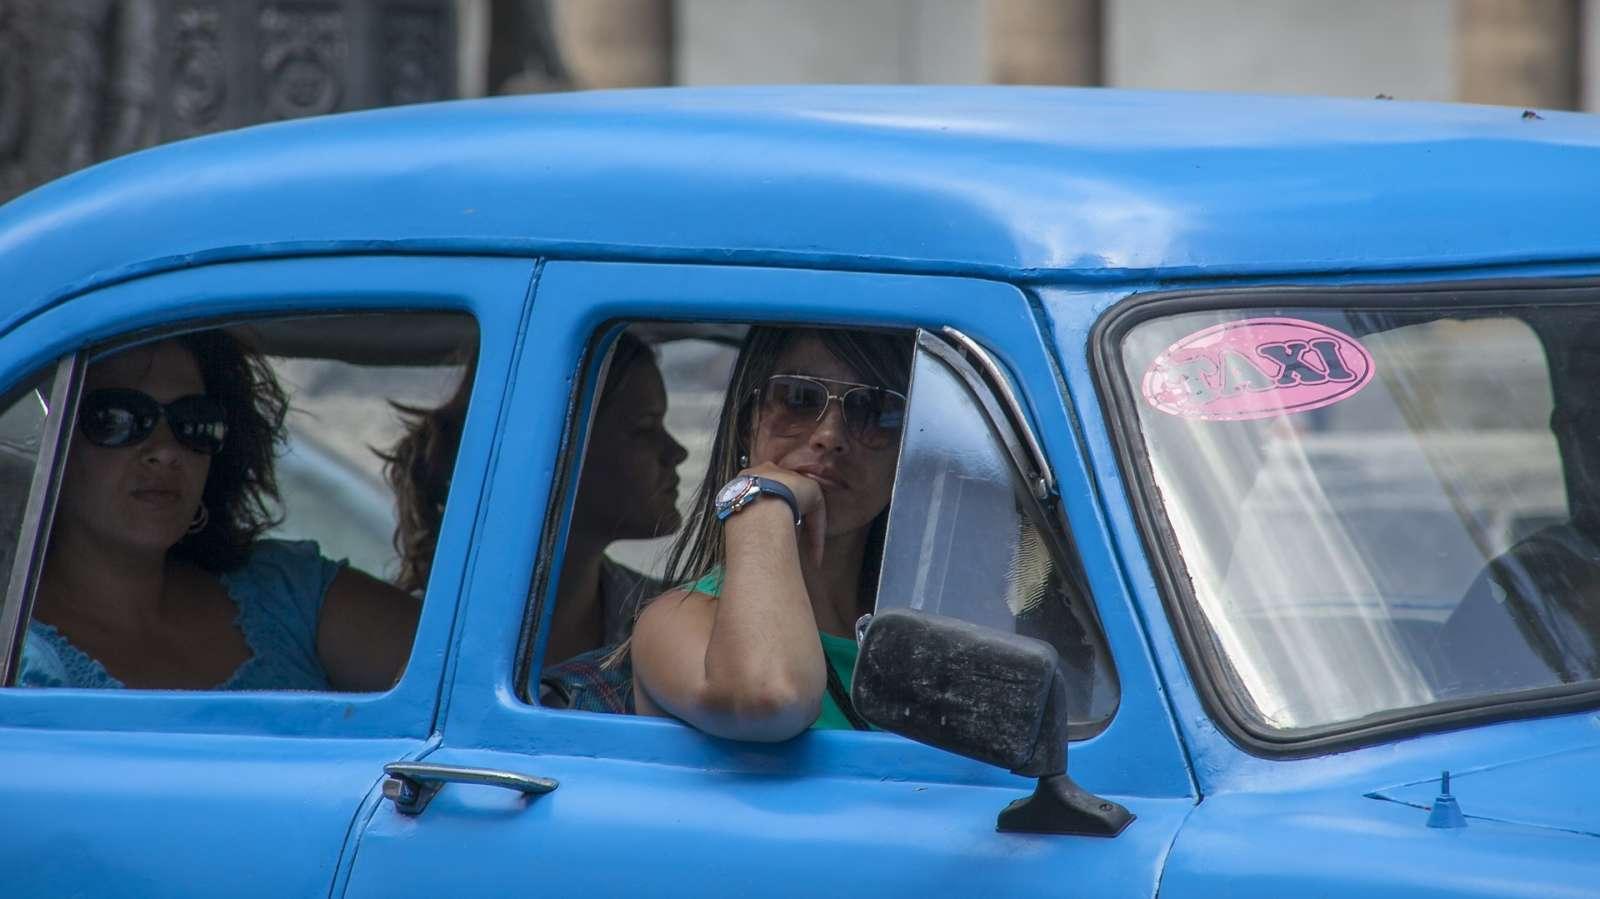 An old taxi in Havana, Cuba